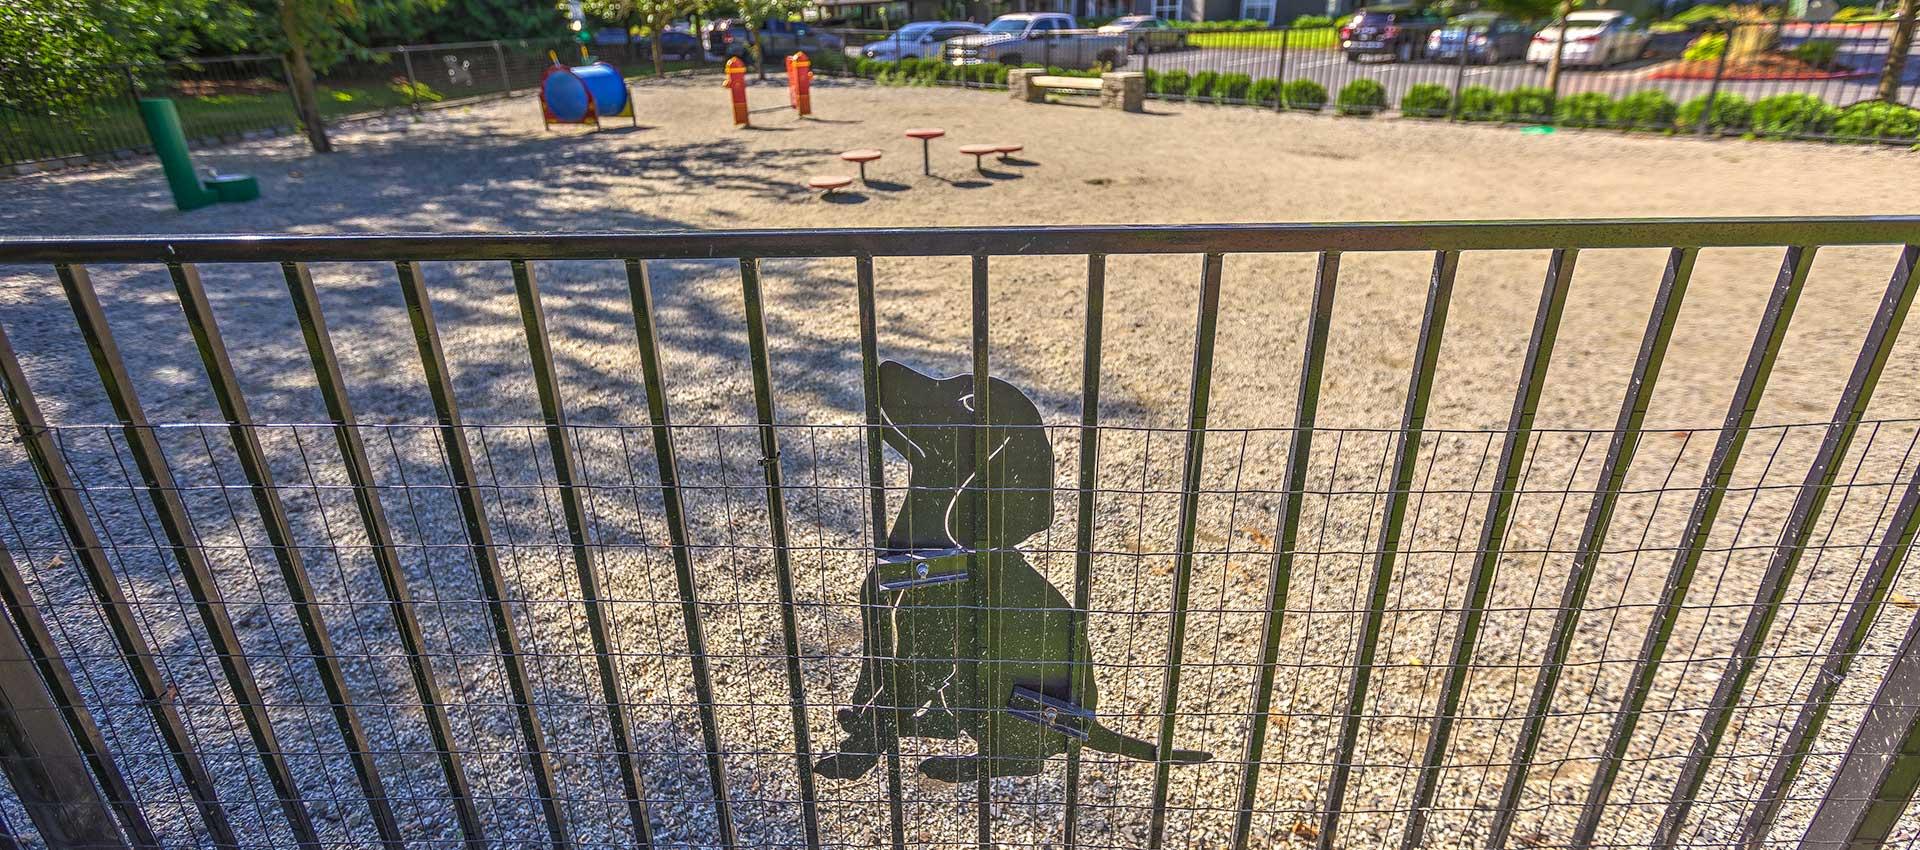 Dog park at Centro Apartment Homes in Hillsboro, Oregon